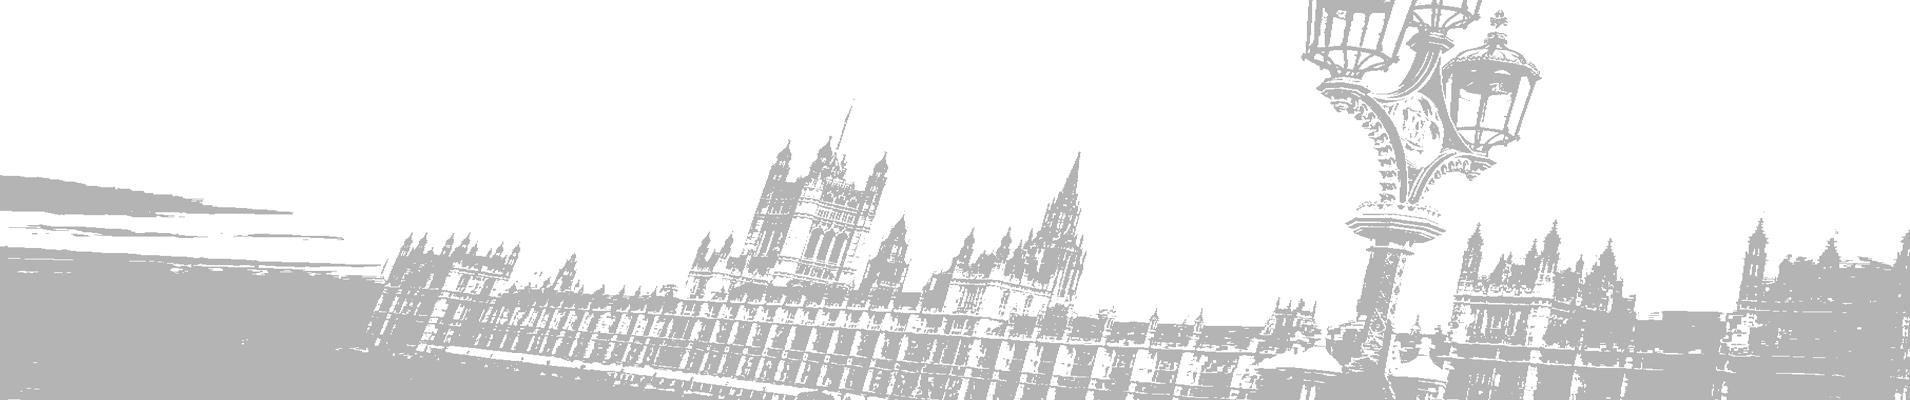 london_new